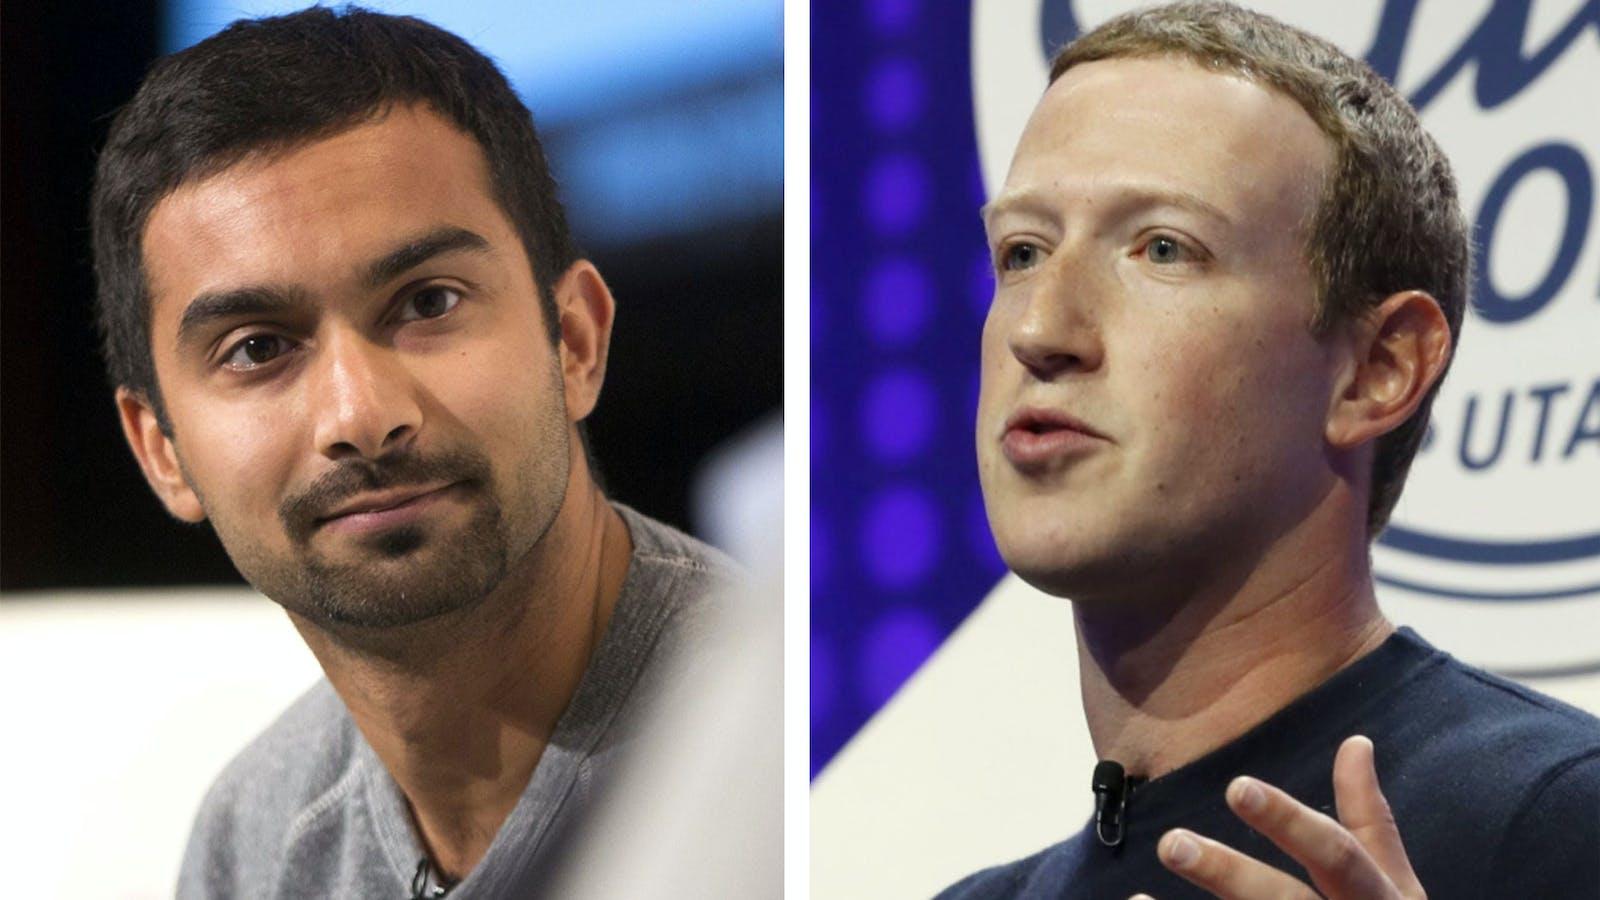 Instacart CEO Apoorva Mehta, left, and Facebook CEO Mark Zuckerberg. Photos by Bloomberg